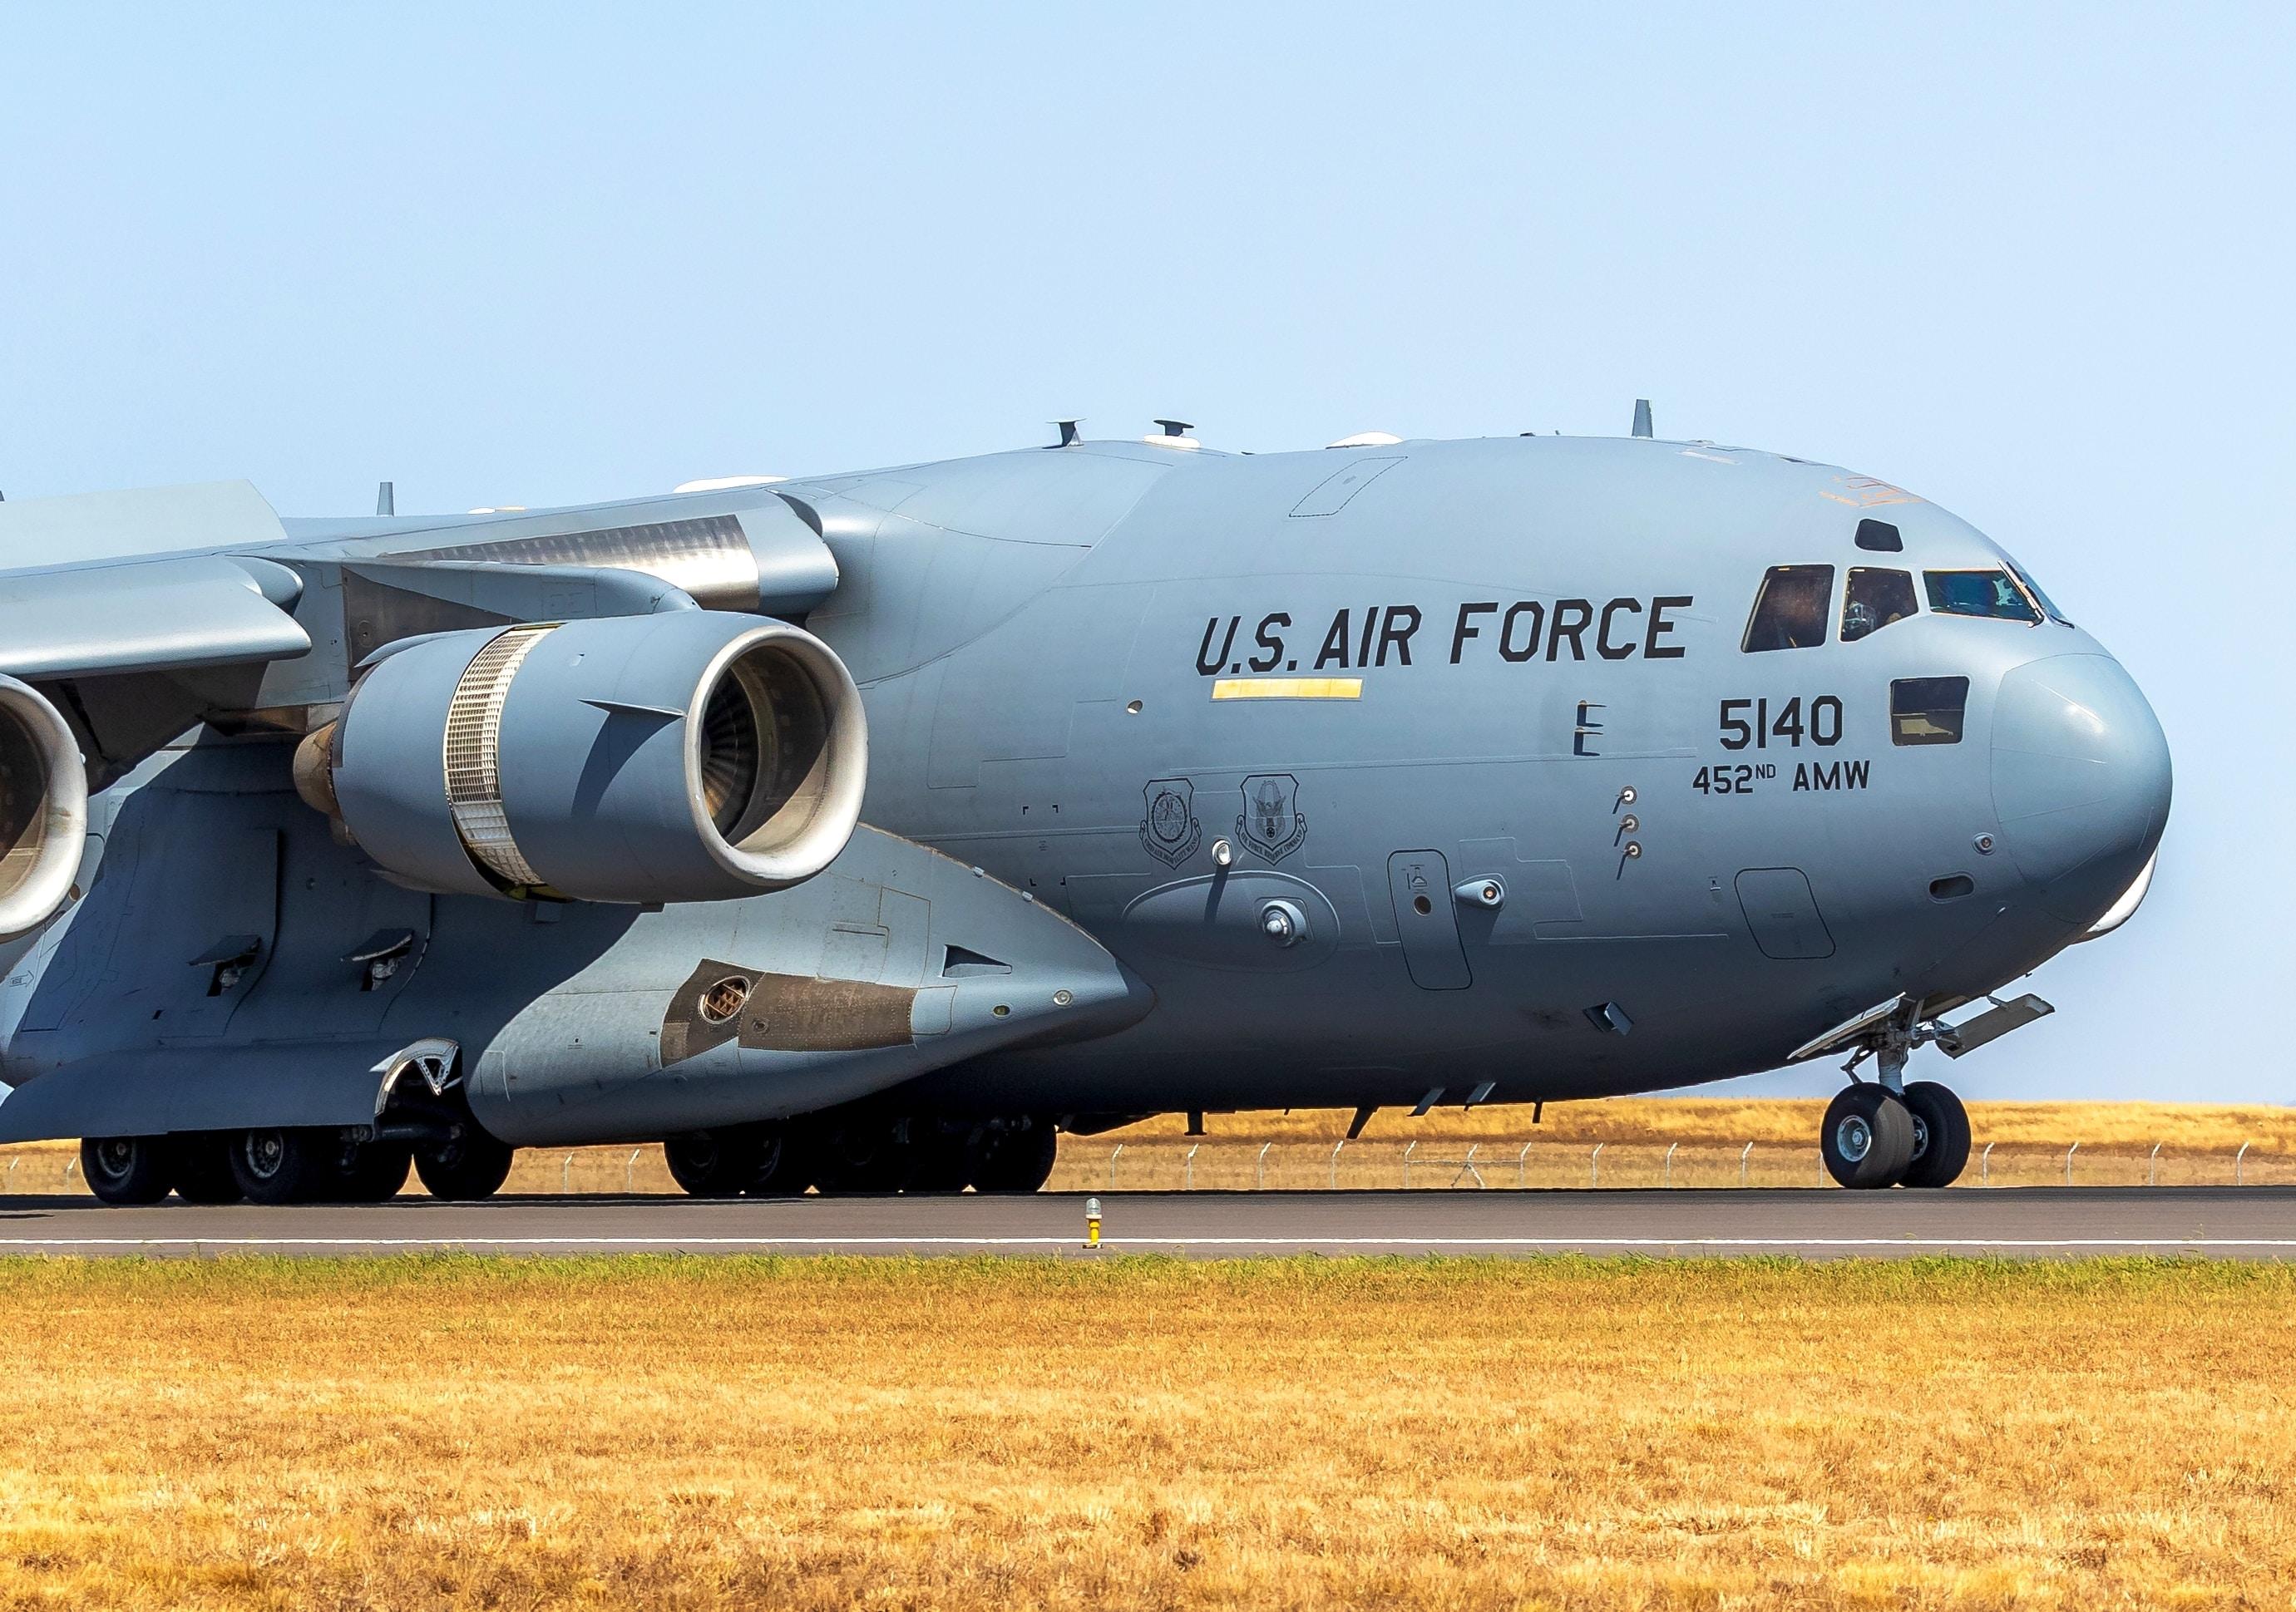 grey US Air Force plane